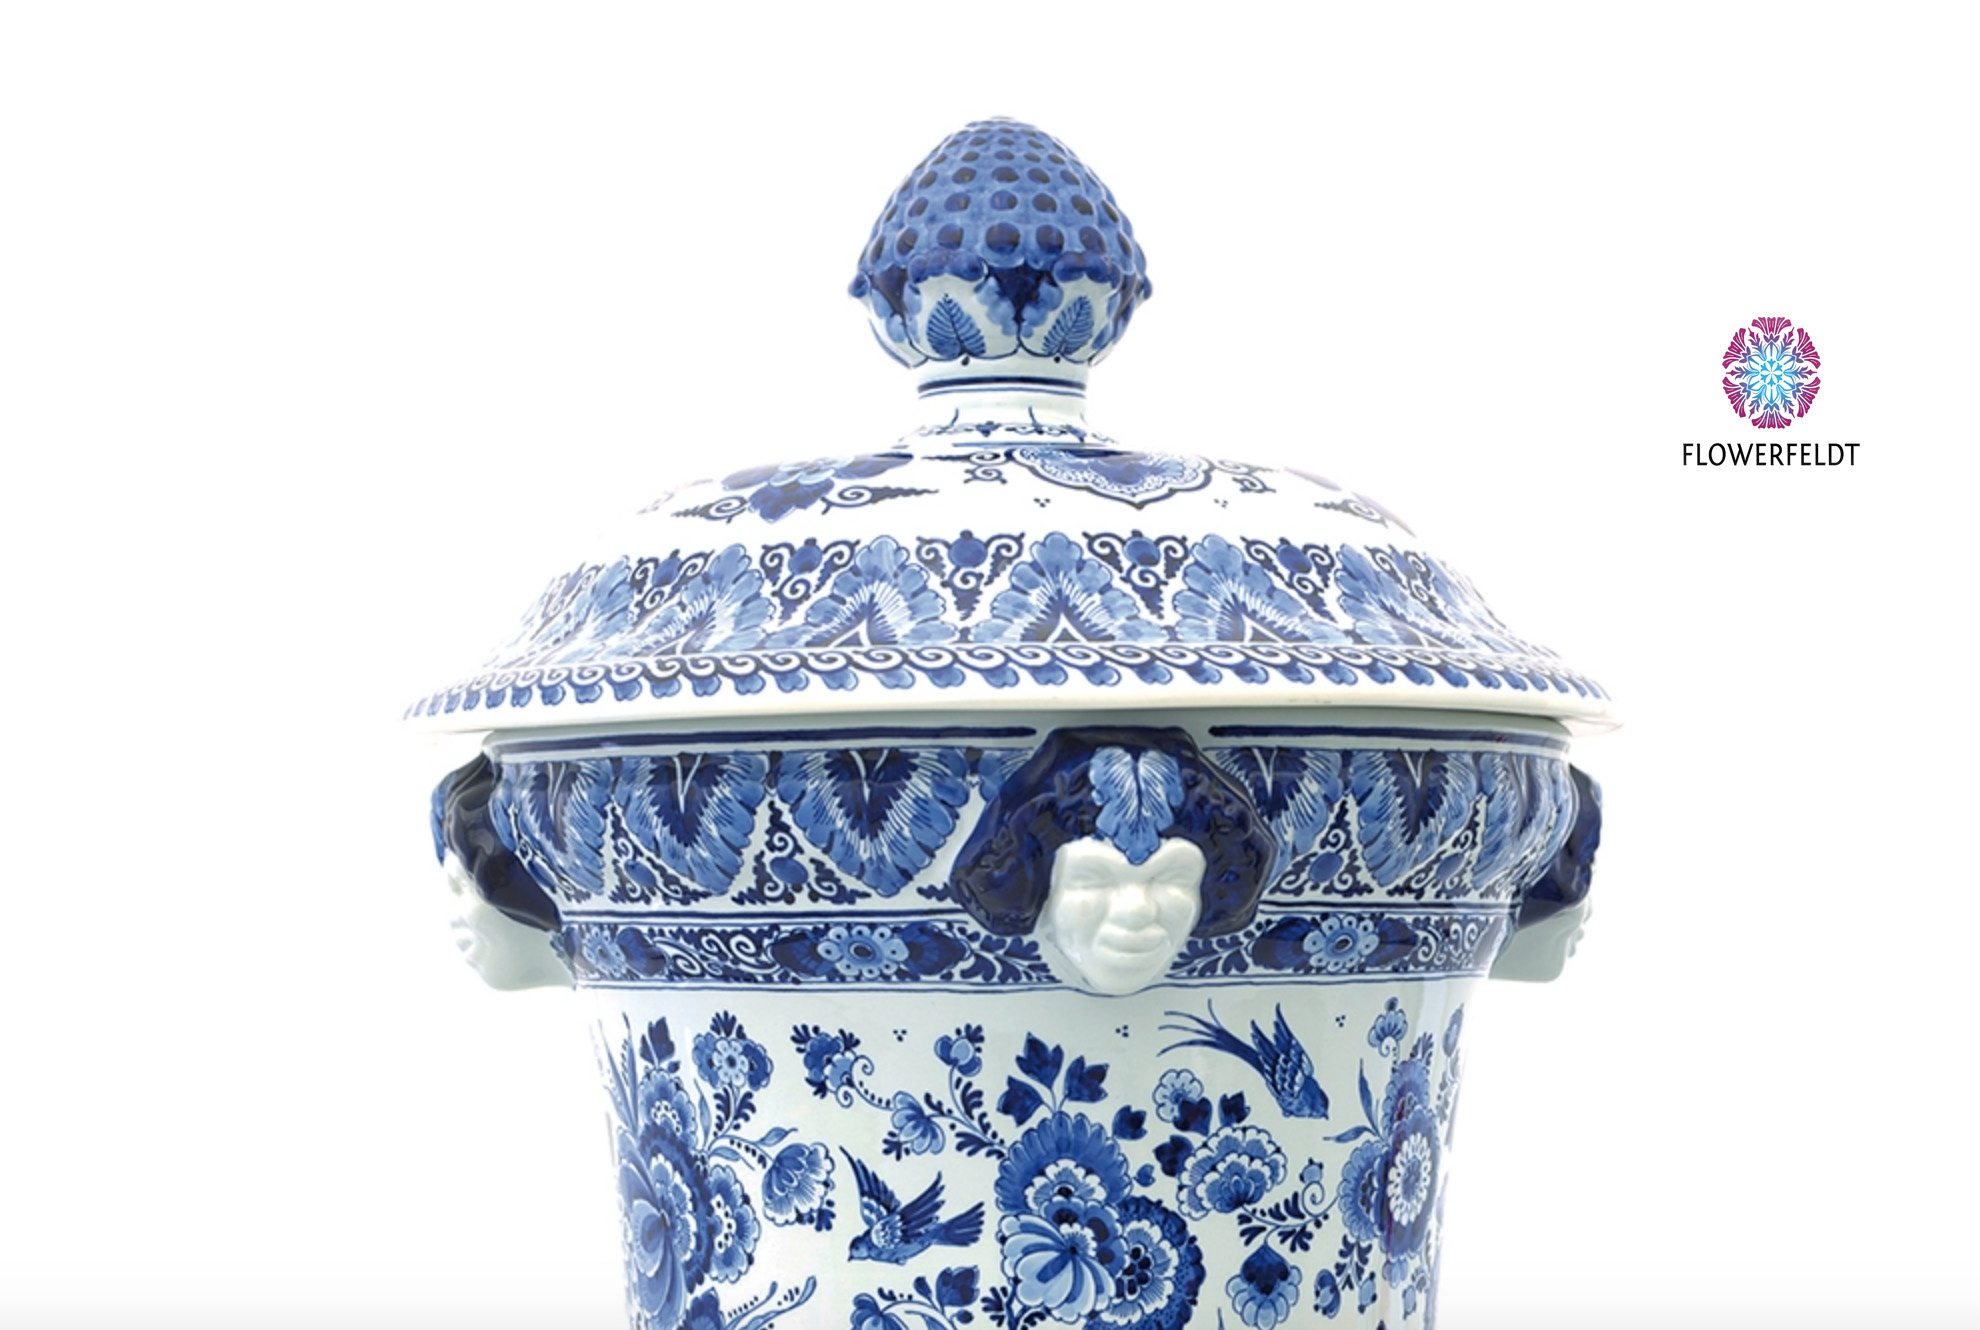 Delfts blauw Satervaas - H67 cm